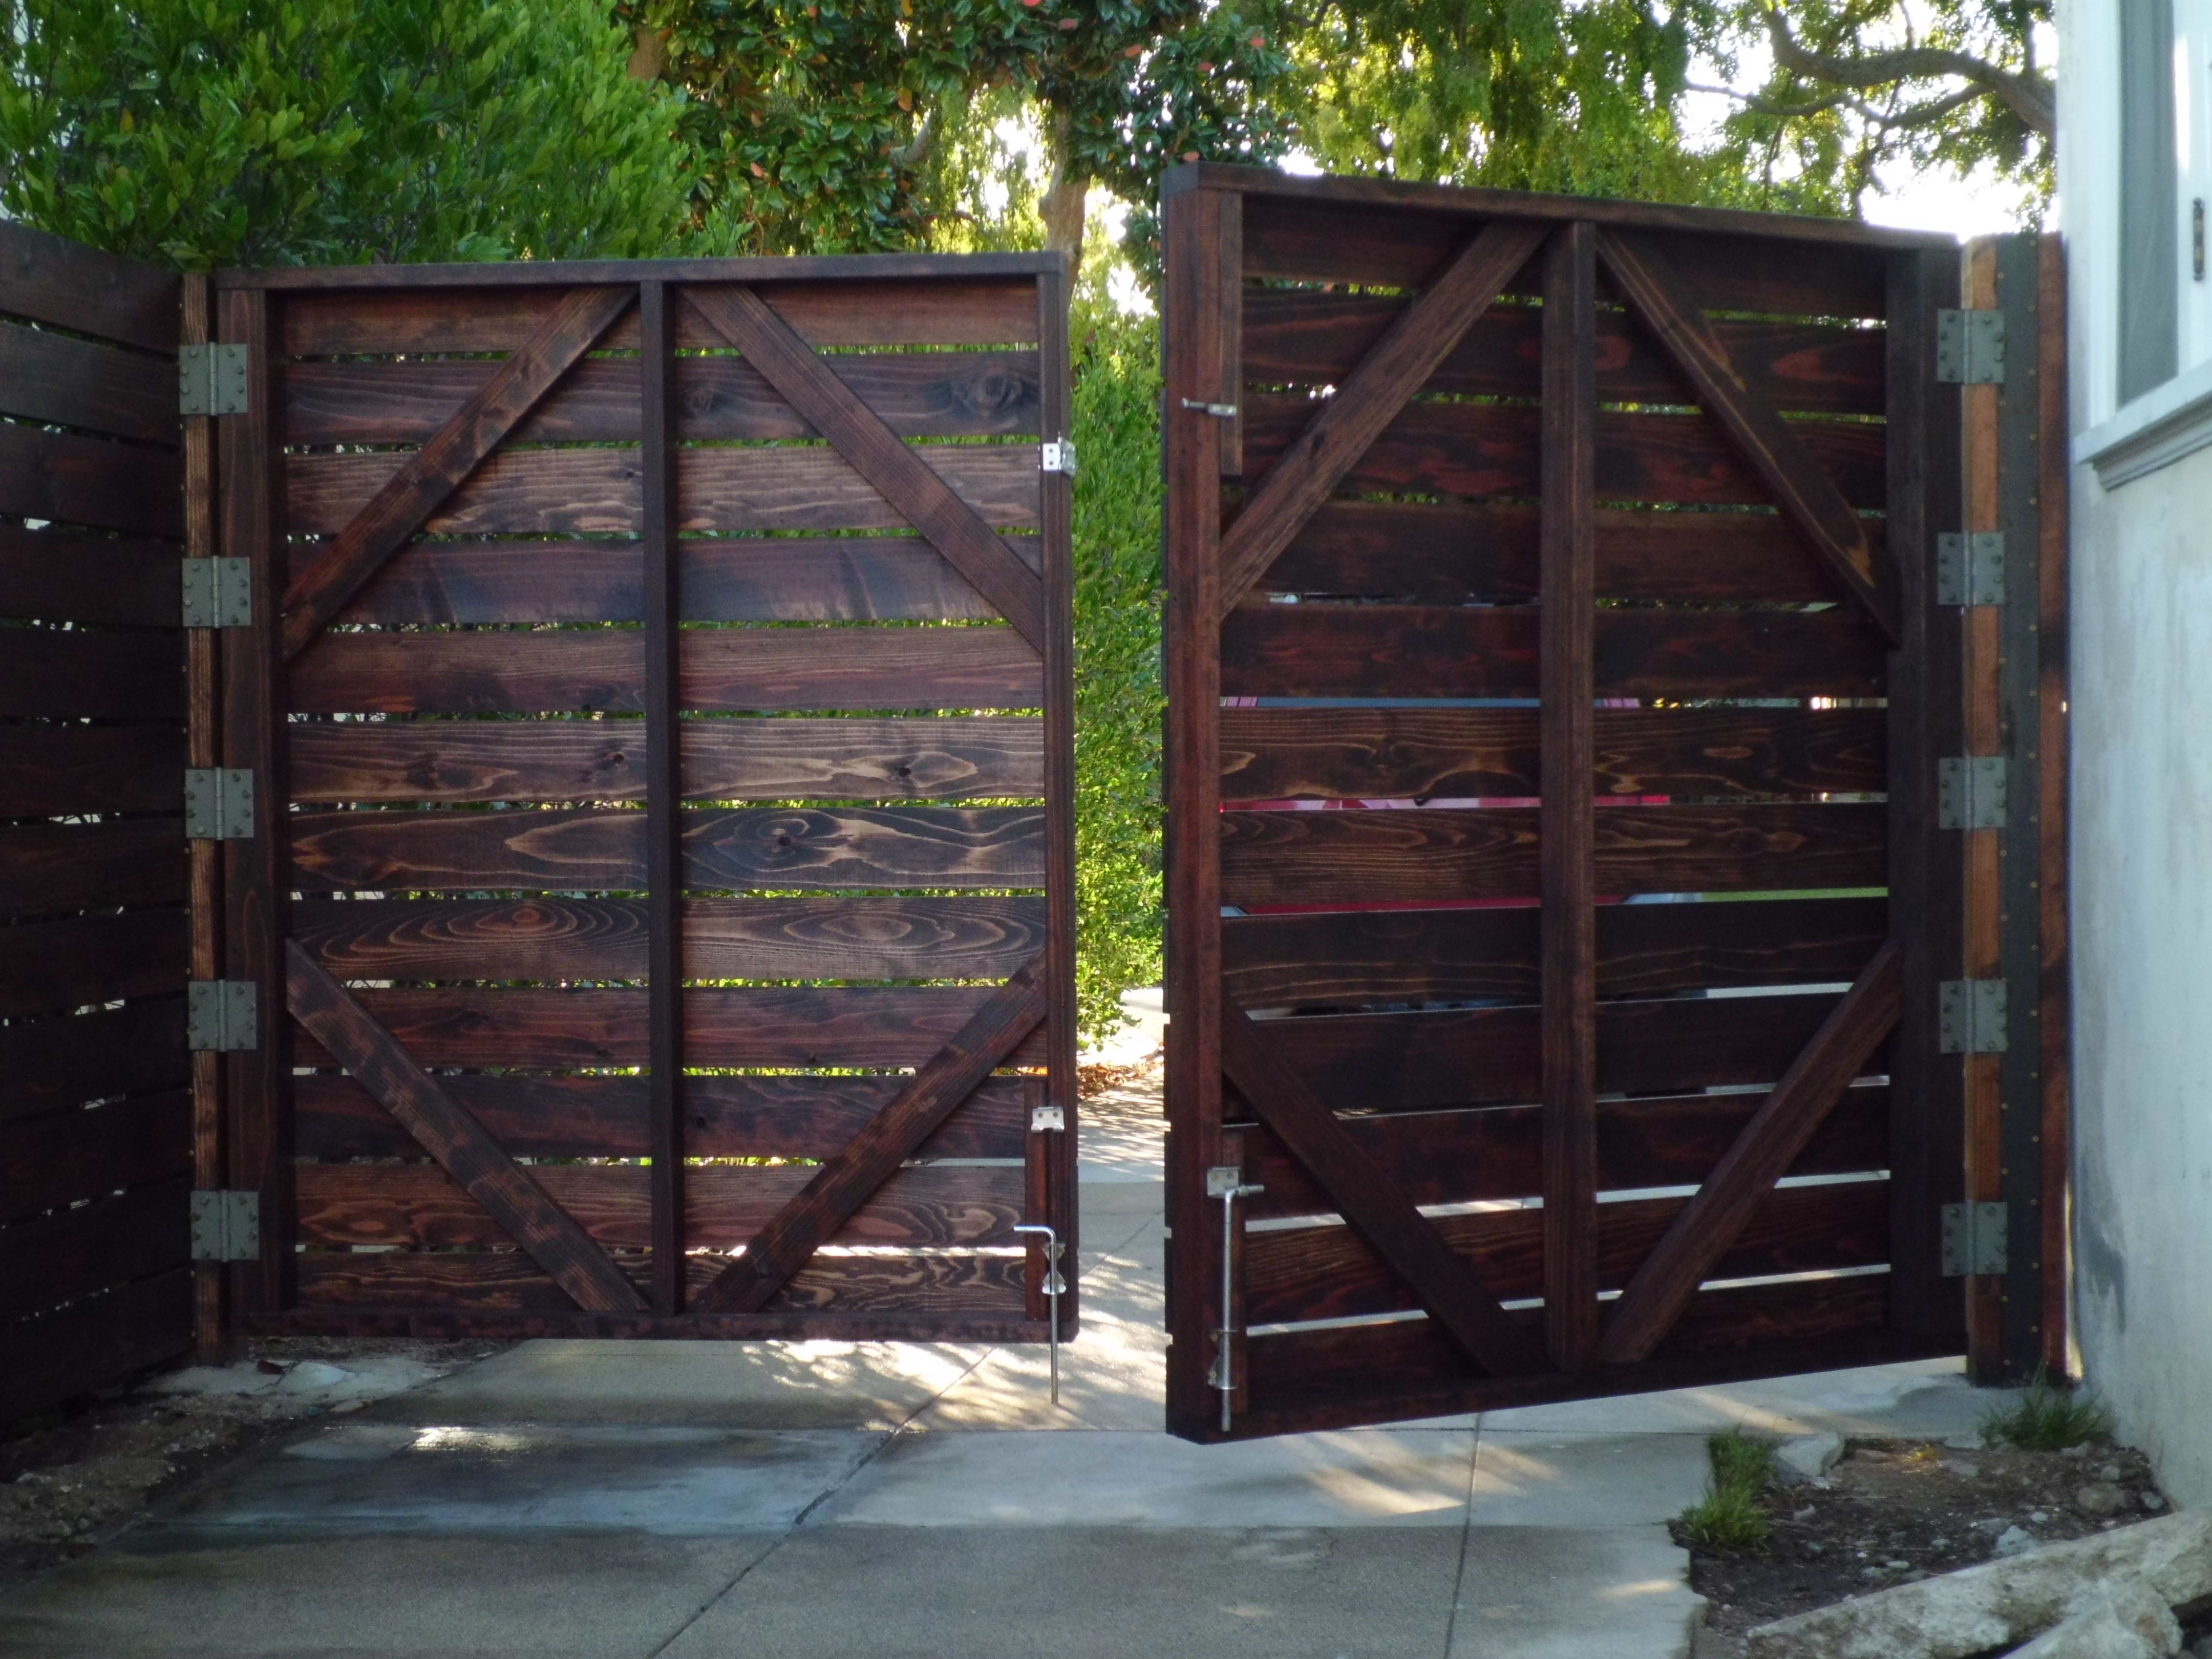 driveway fence blog awesome wood. Black Bedroom Furniture Sets. Home Design Ideas